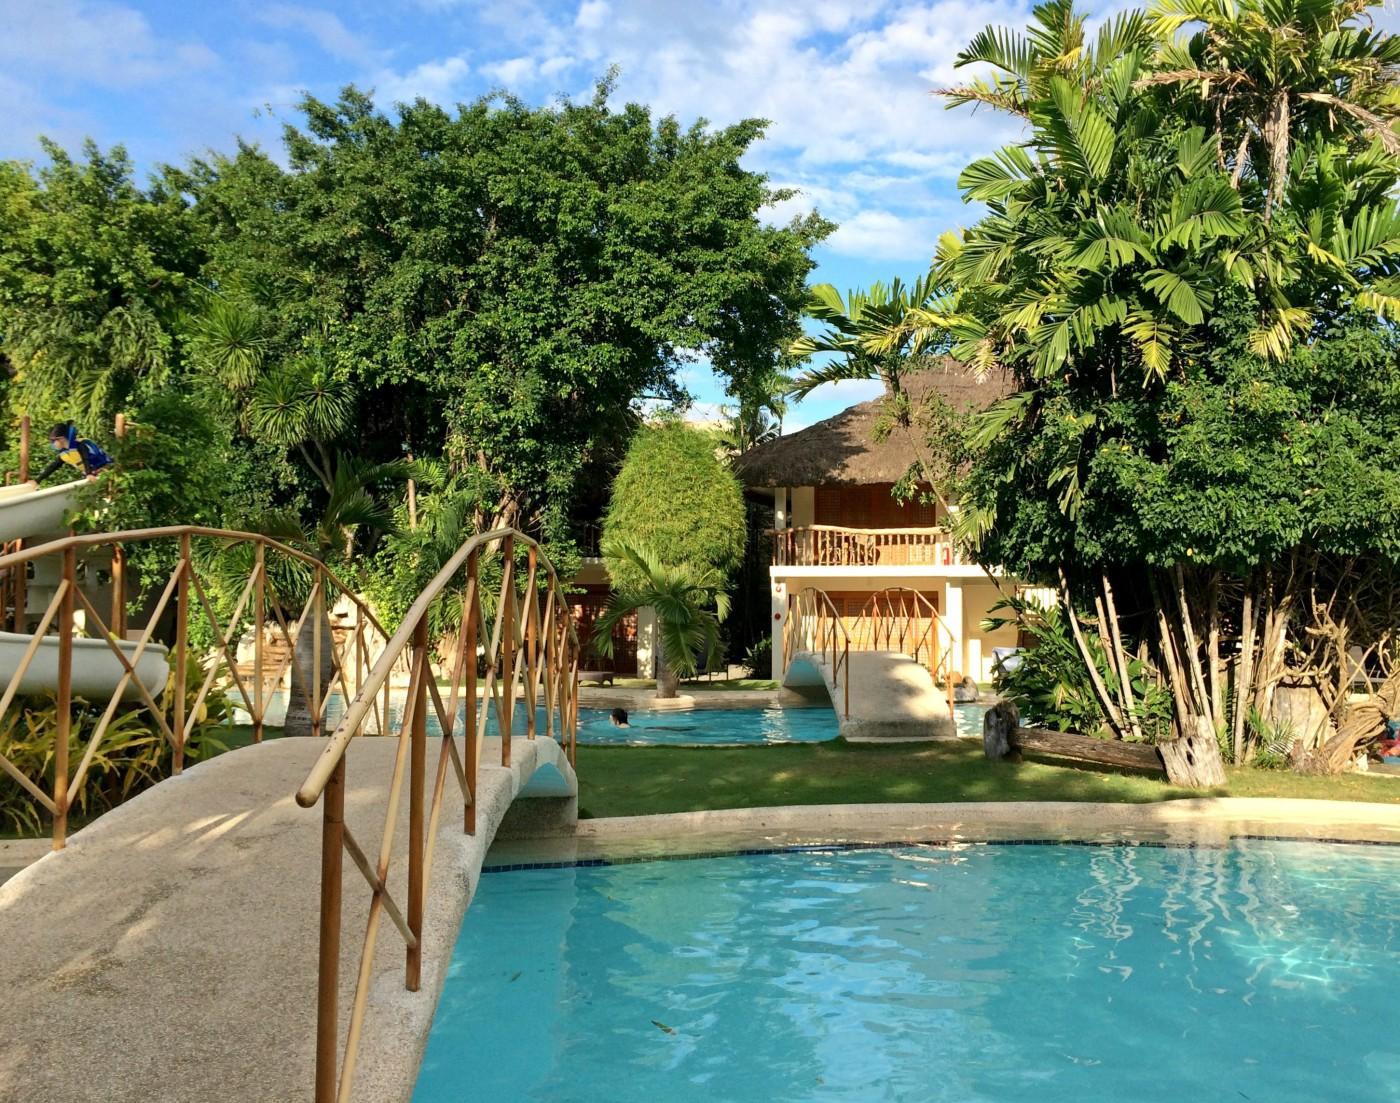 Incredible weekend staycation at Maribago Bluewater Beach Resort ...